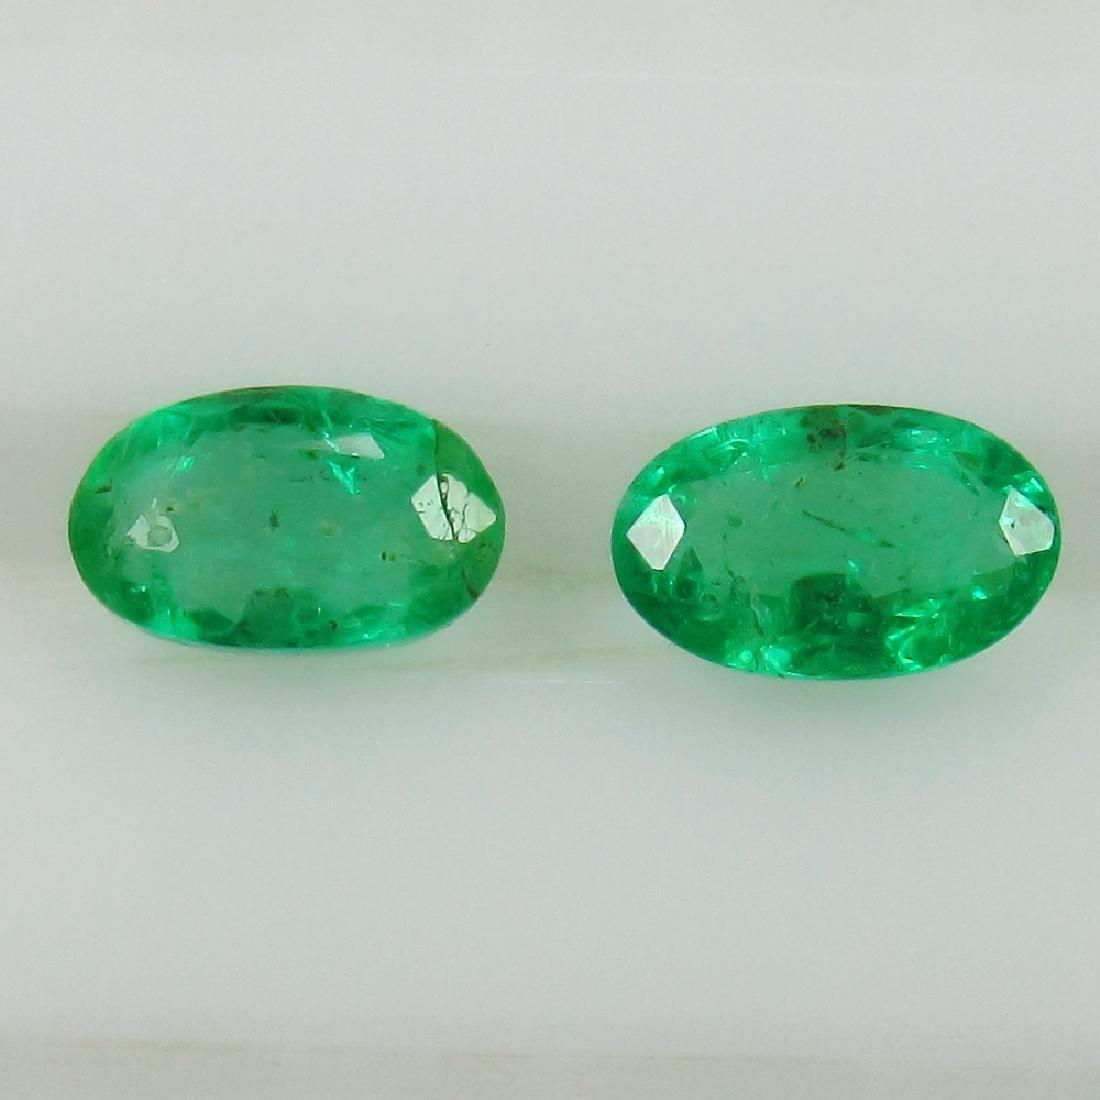 0.54 Ct Genuine Zambian Emerald Matching Oval Pair